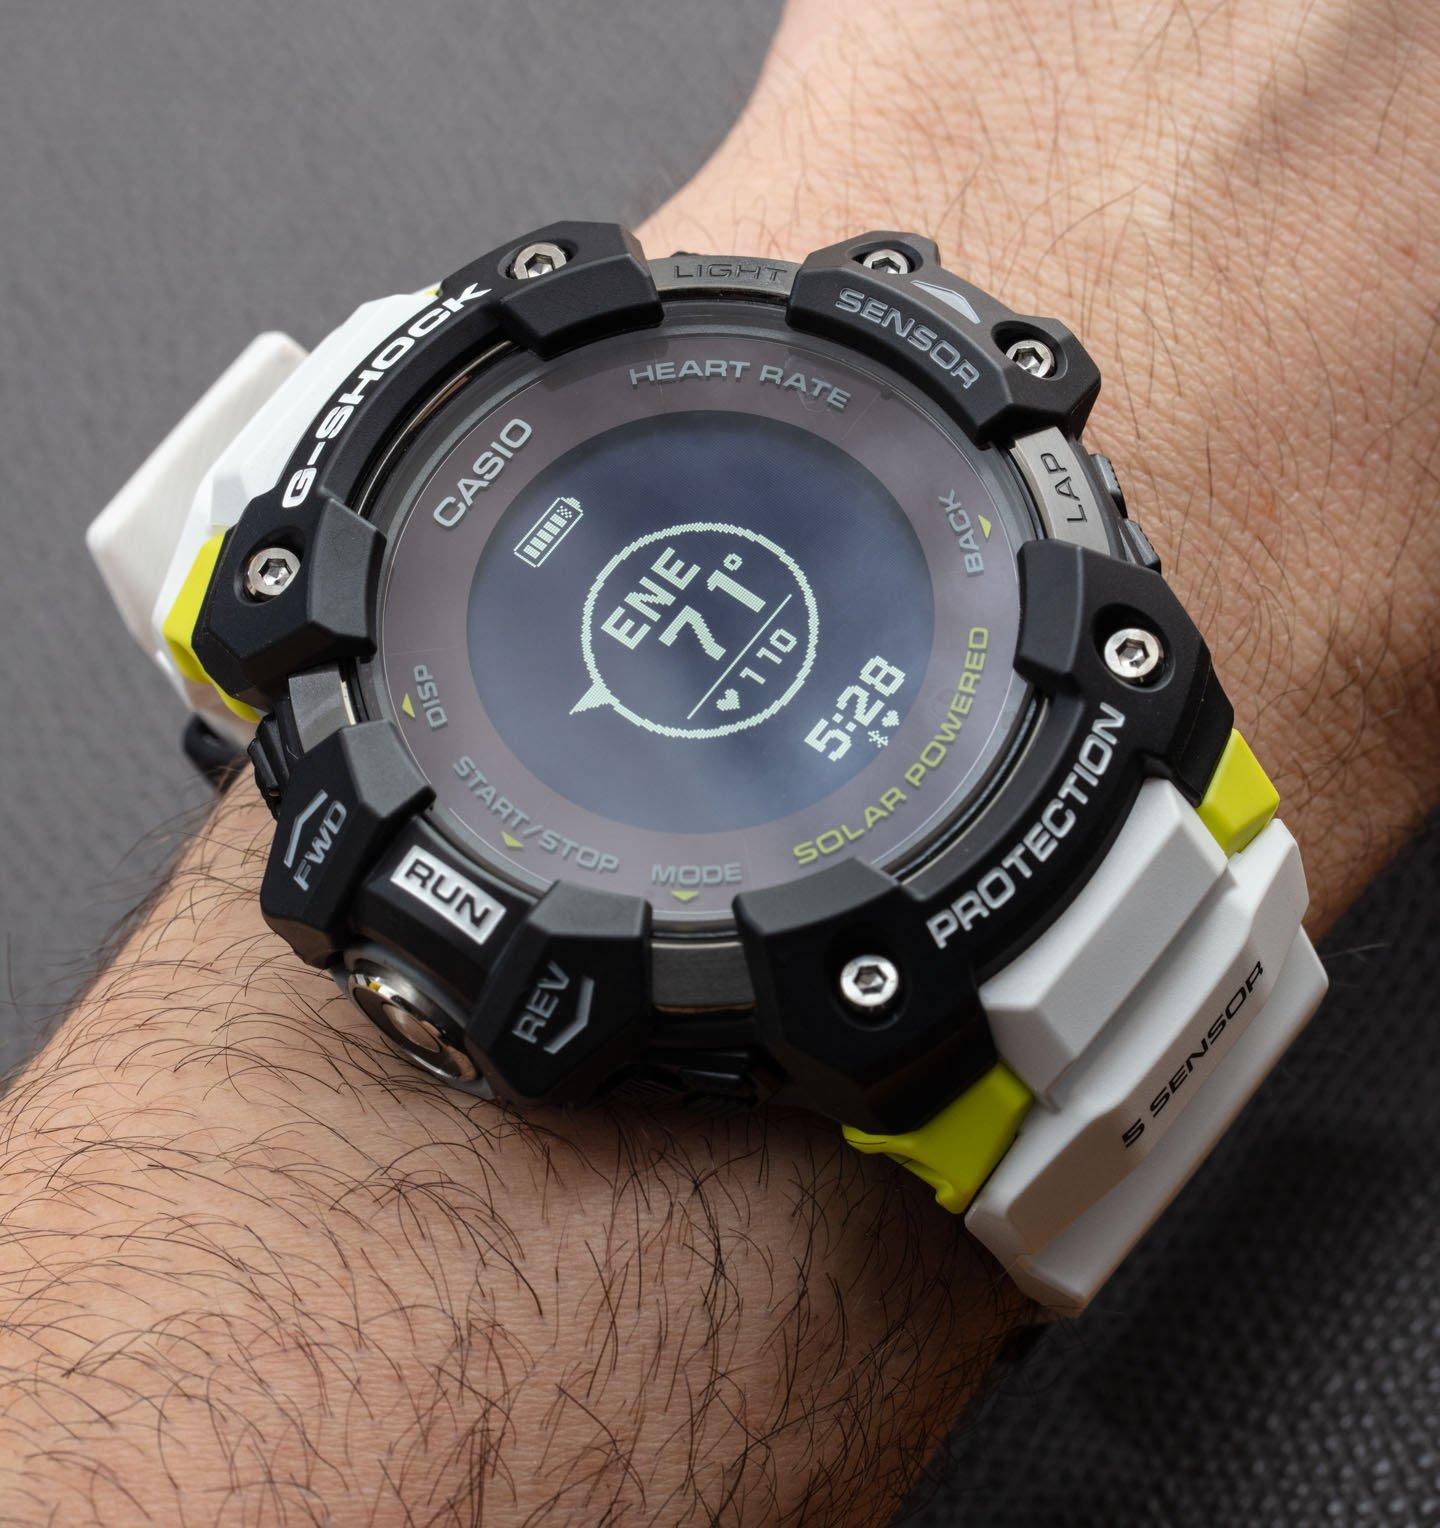 Обзор часов: Casio G-Shock Move GBD-H1000 GPS